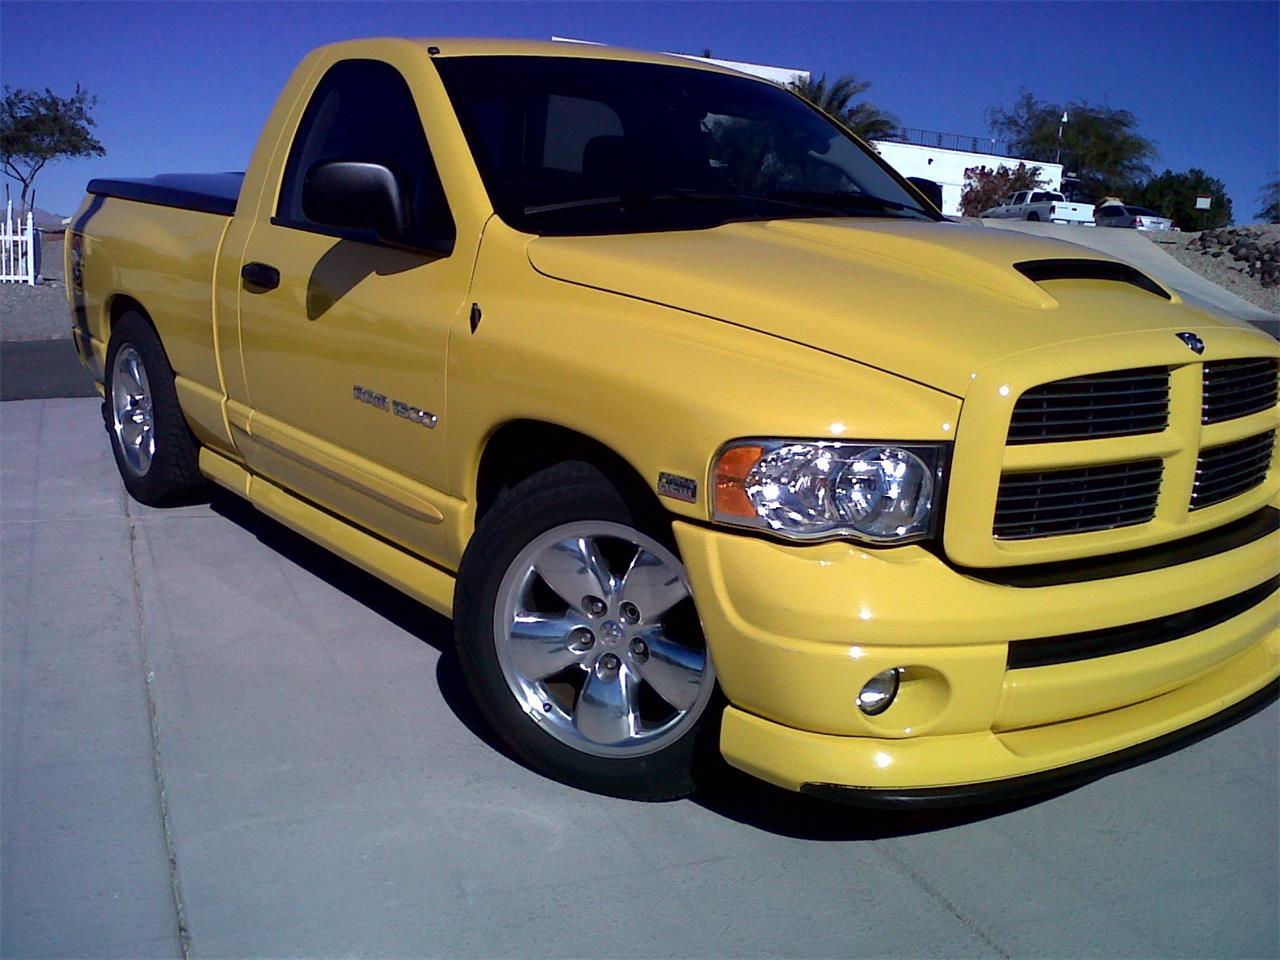 2005 Dodge Ram 1500 Rumble Bee For Sale Classiccars Com Cc 1096800